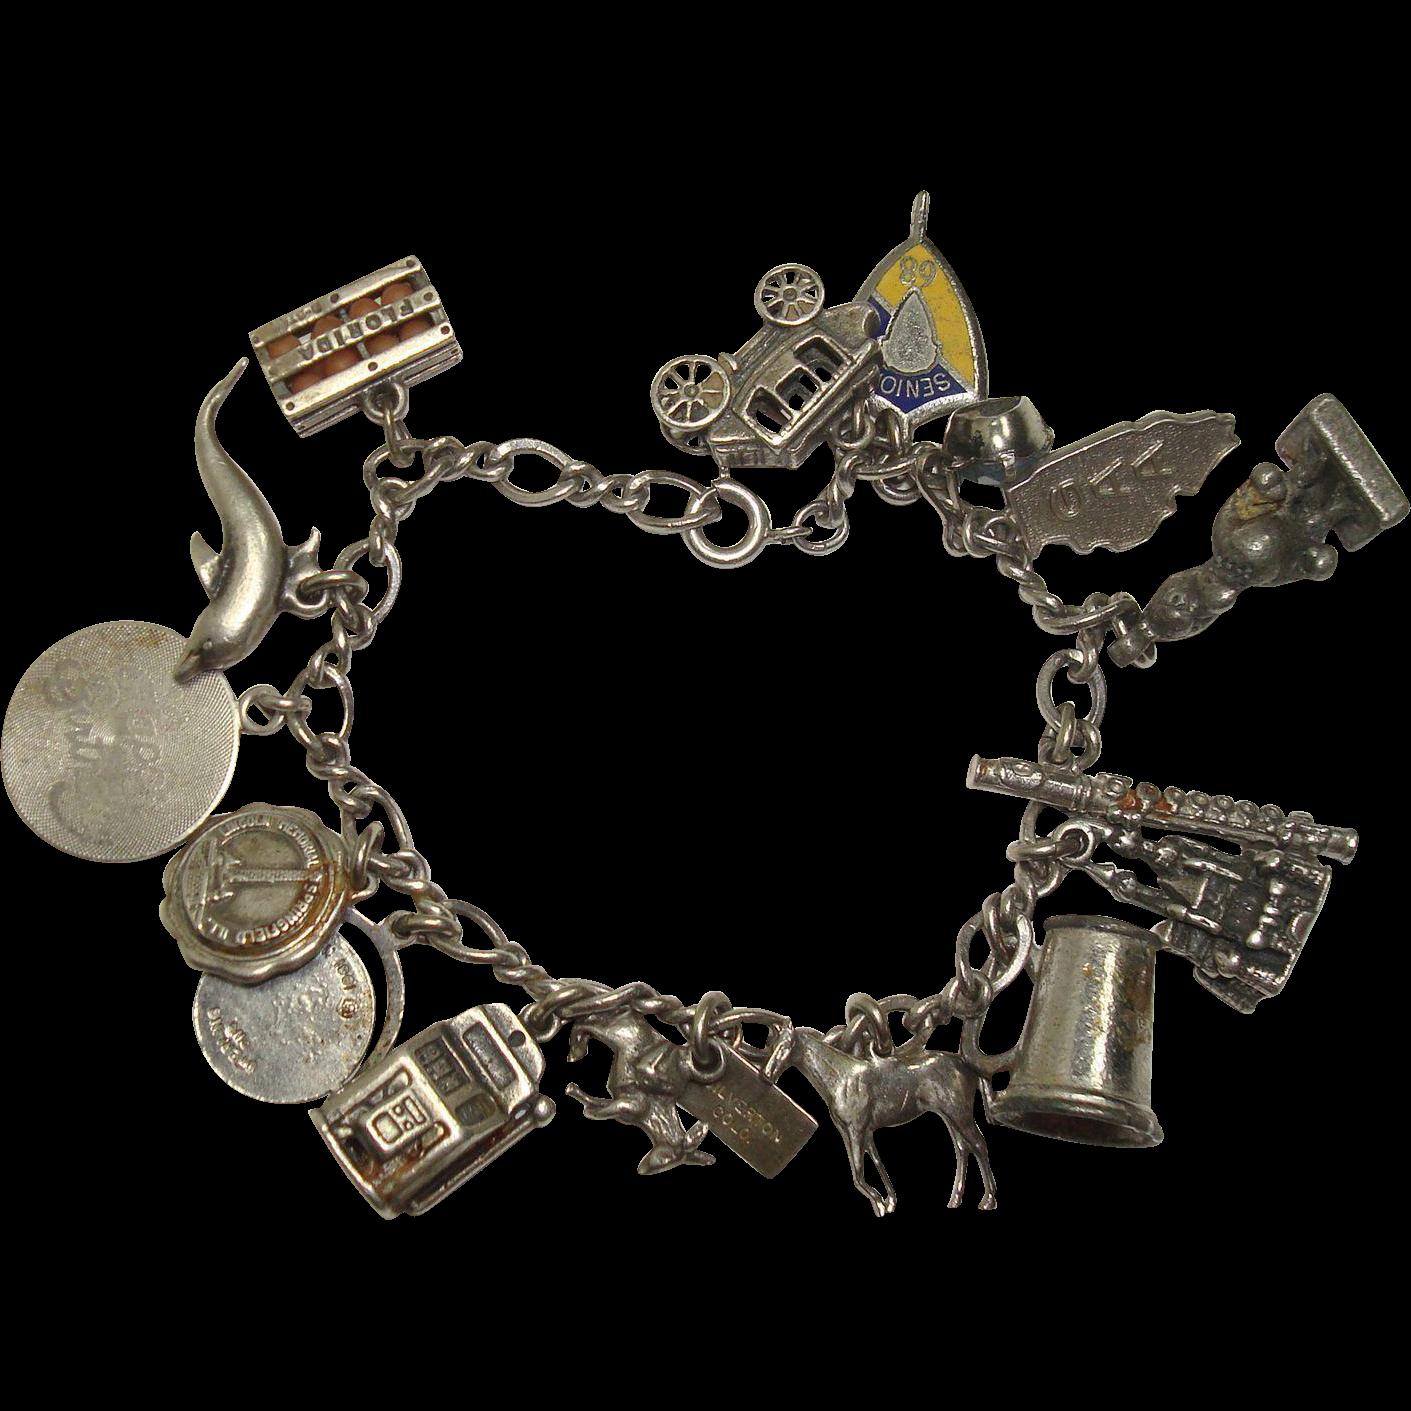 16 Charms Sterling Charm Bracelet